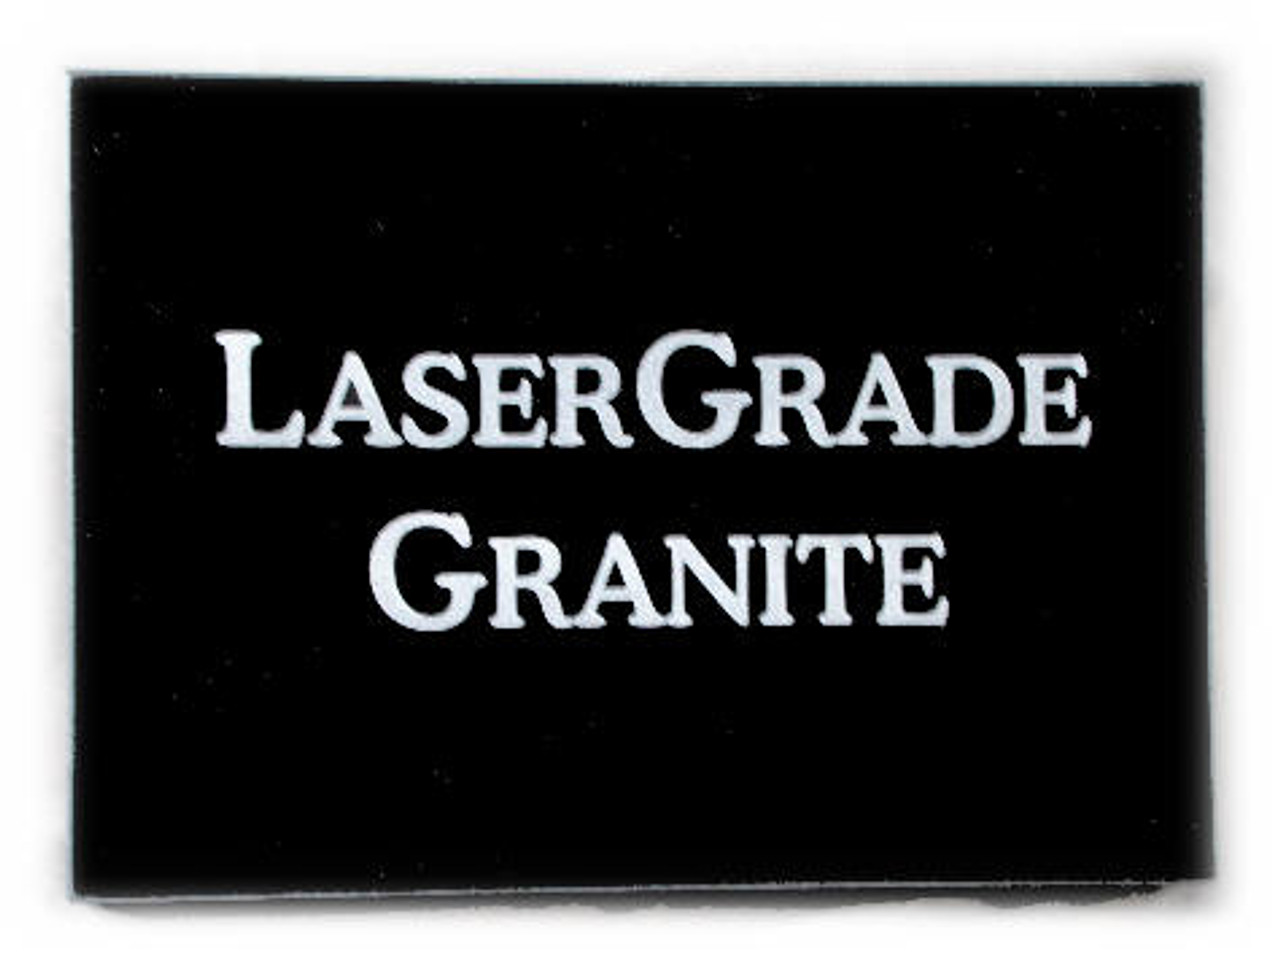 "G-MB-5x7ASP/:  LaserGrade, MB,  Black Granite, 5"" x 7"" x 7 - 8 mm,  All Surfaces Polished, (5 face polished) - Case of 10"